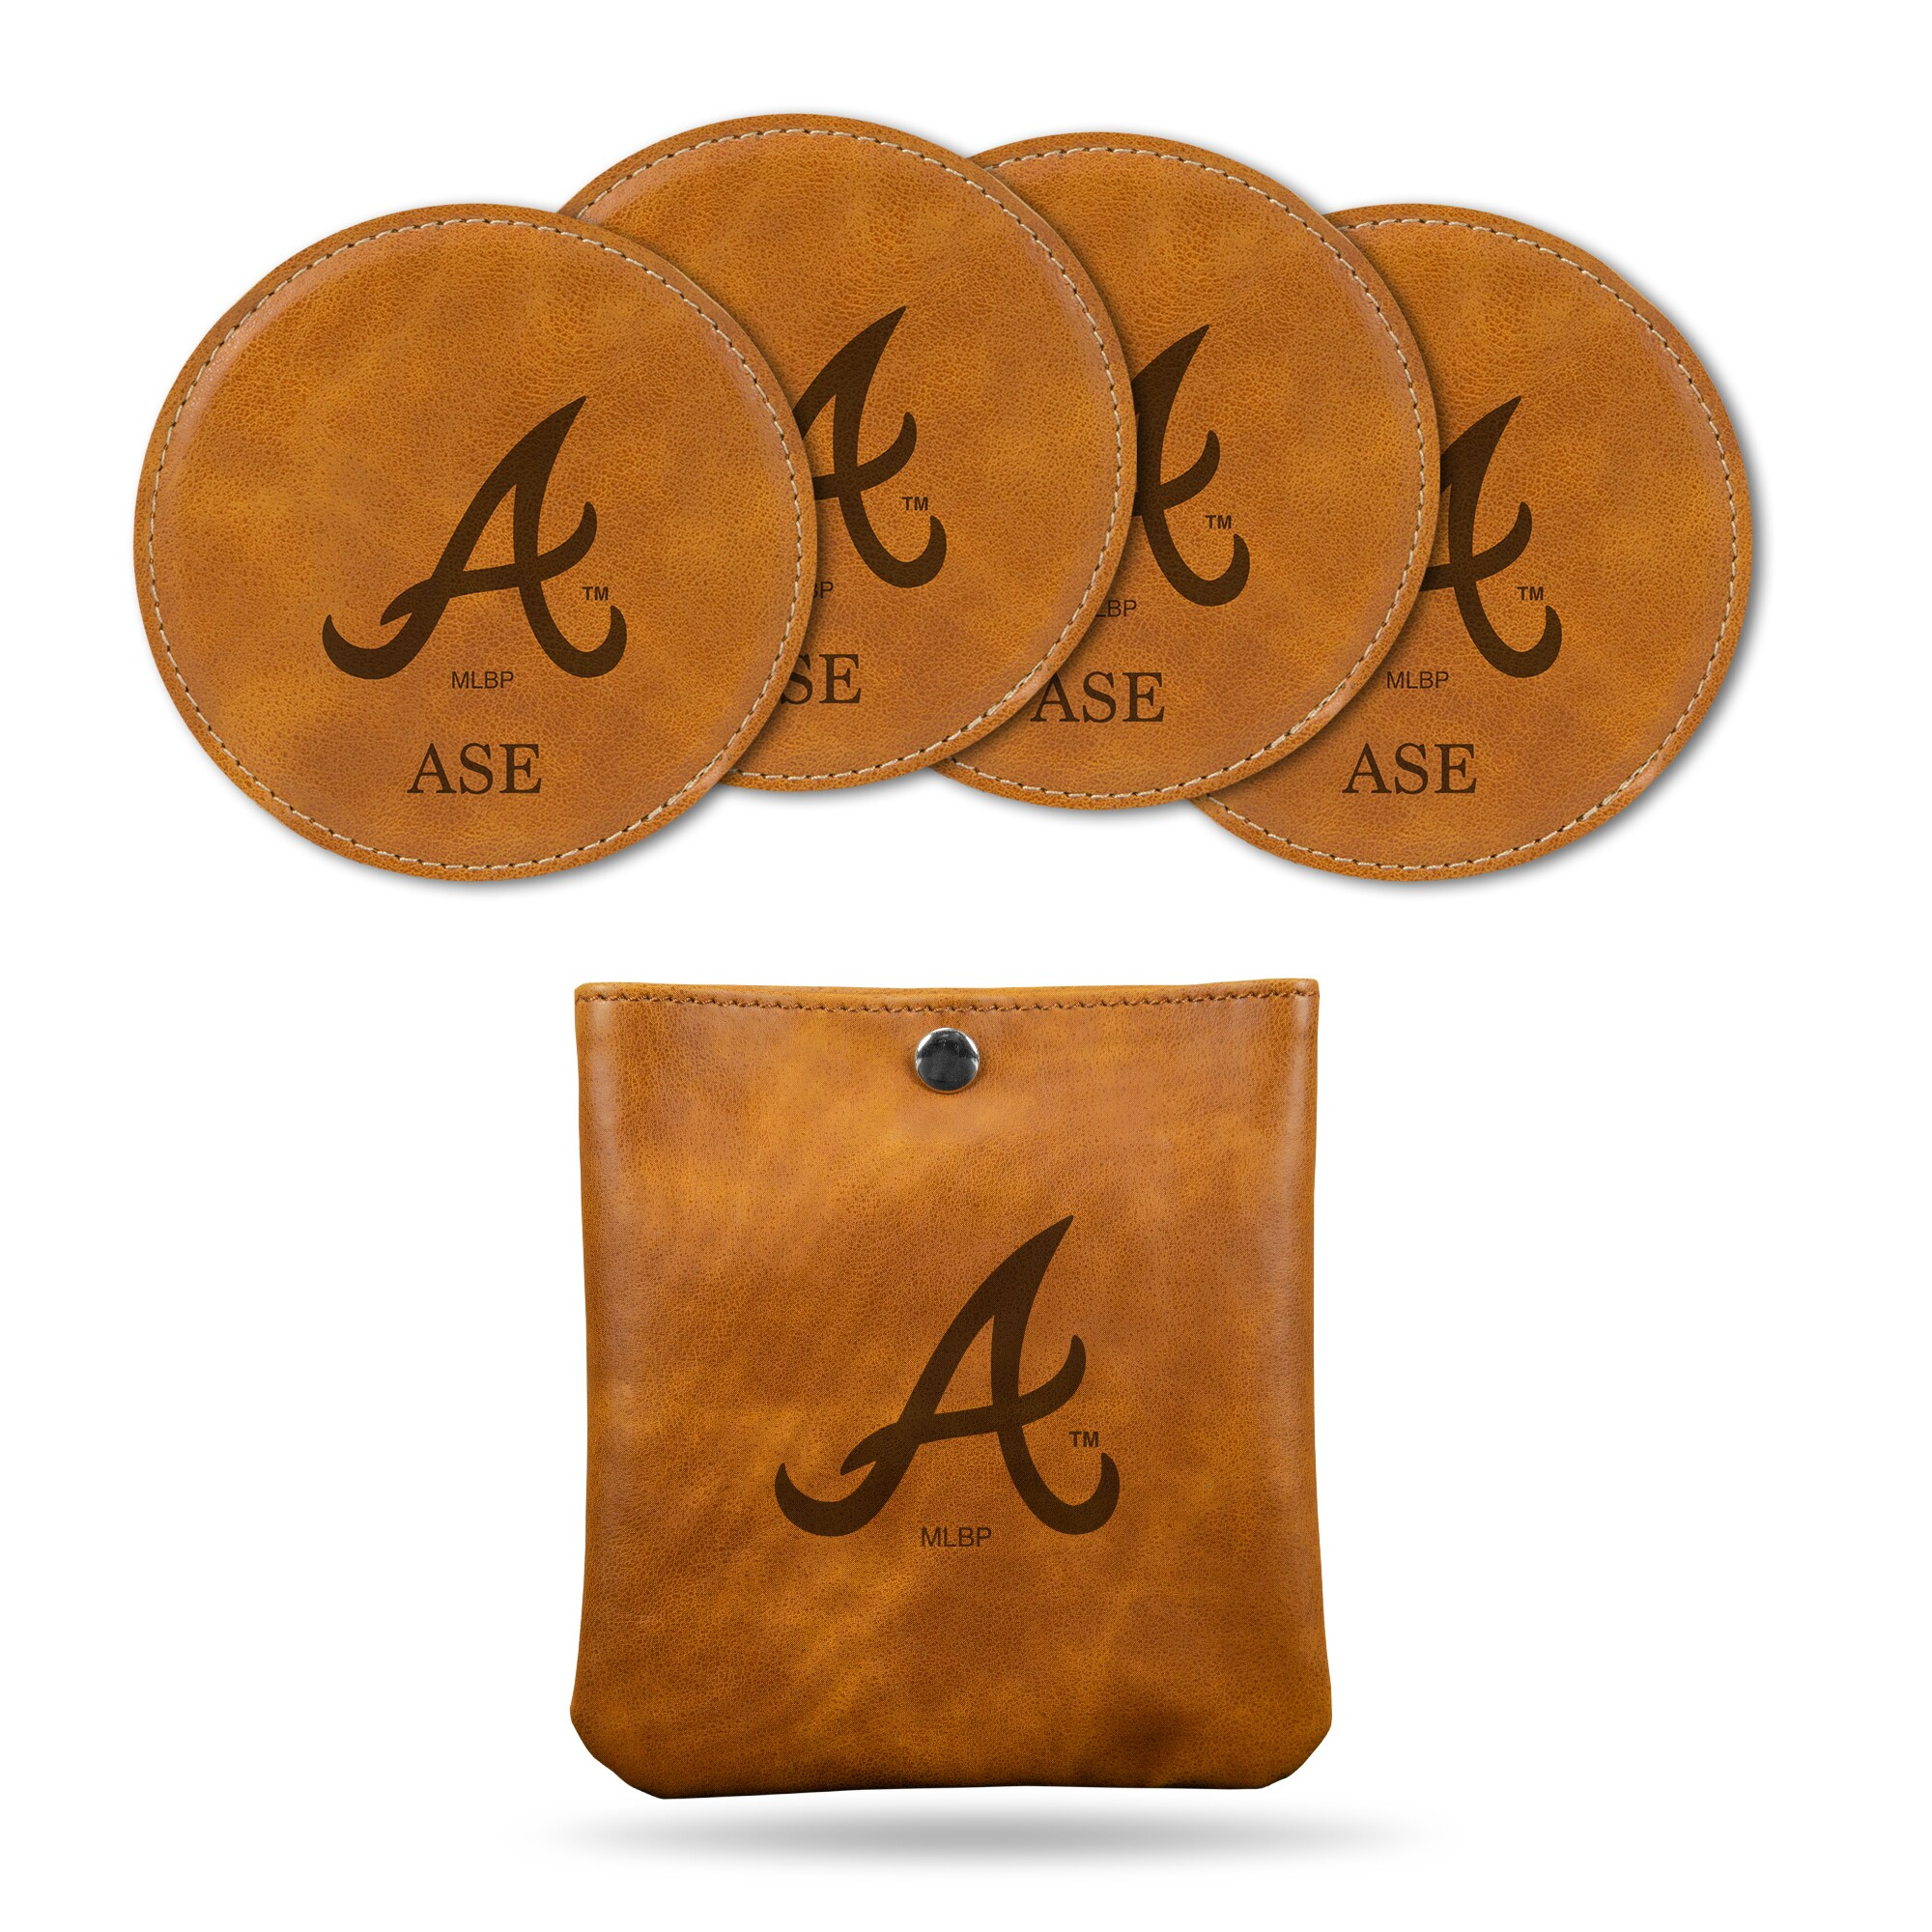 Atlanta Braves Sparo 4-Pack Personalized Coaster Set - Brown